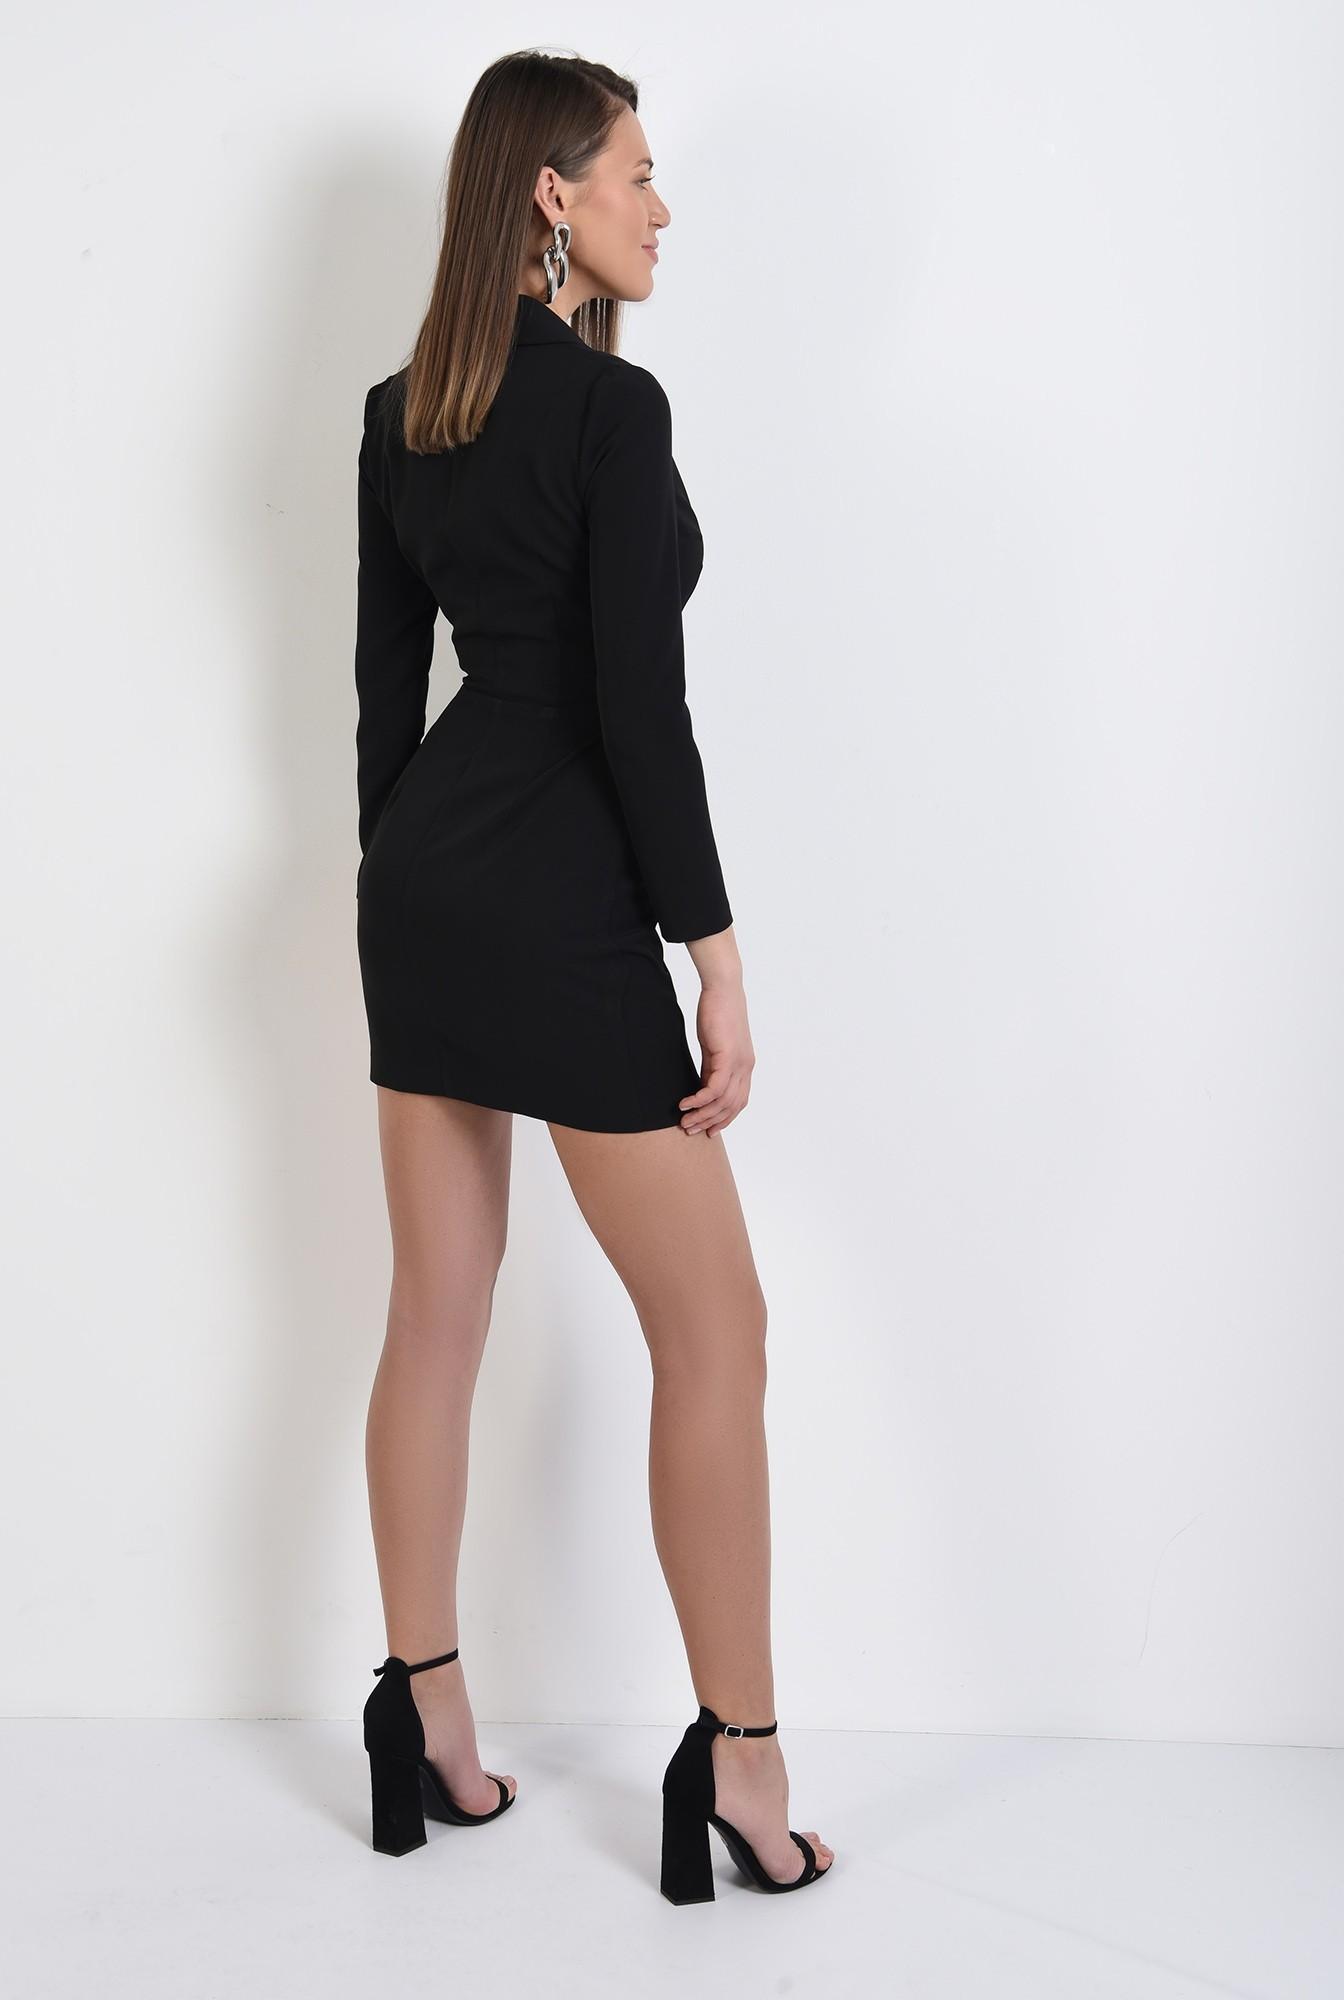 1 - rochie mini, neagra, cu revere, scurta, maneci ajustate, Poema